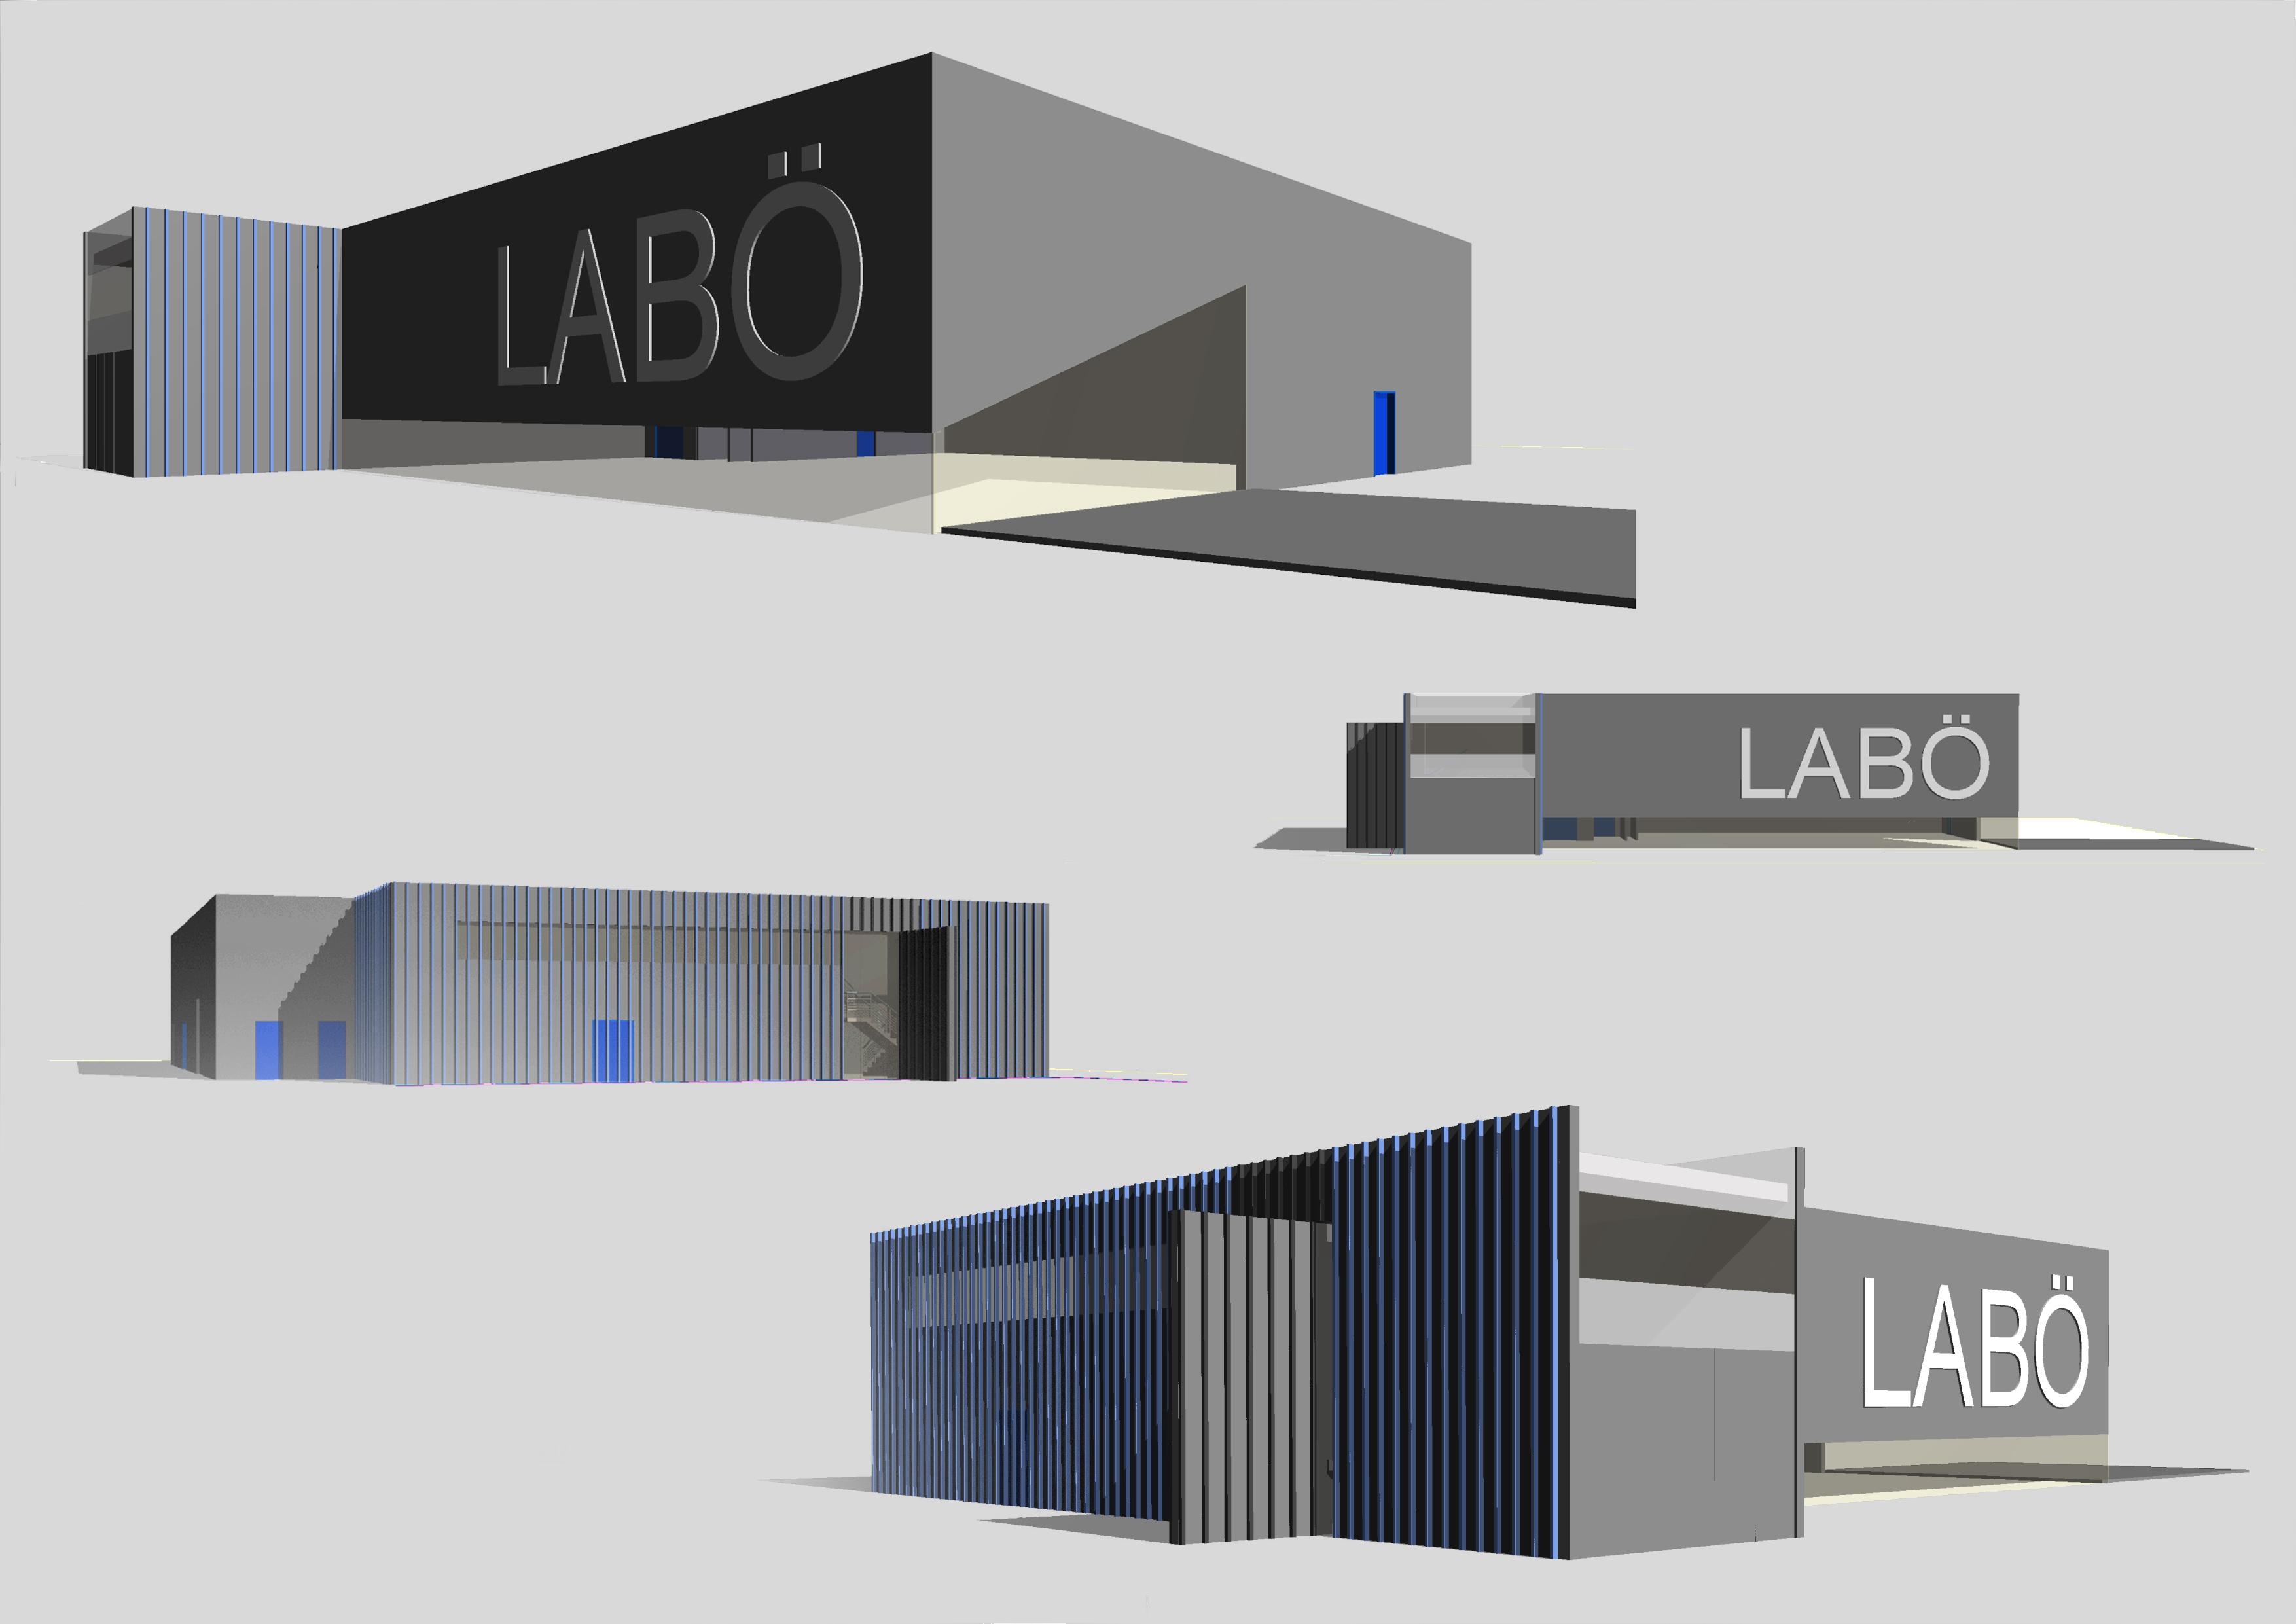 Projet_Labö_2_def.JPG